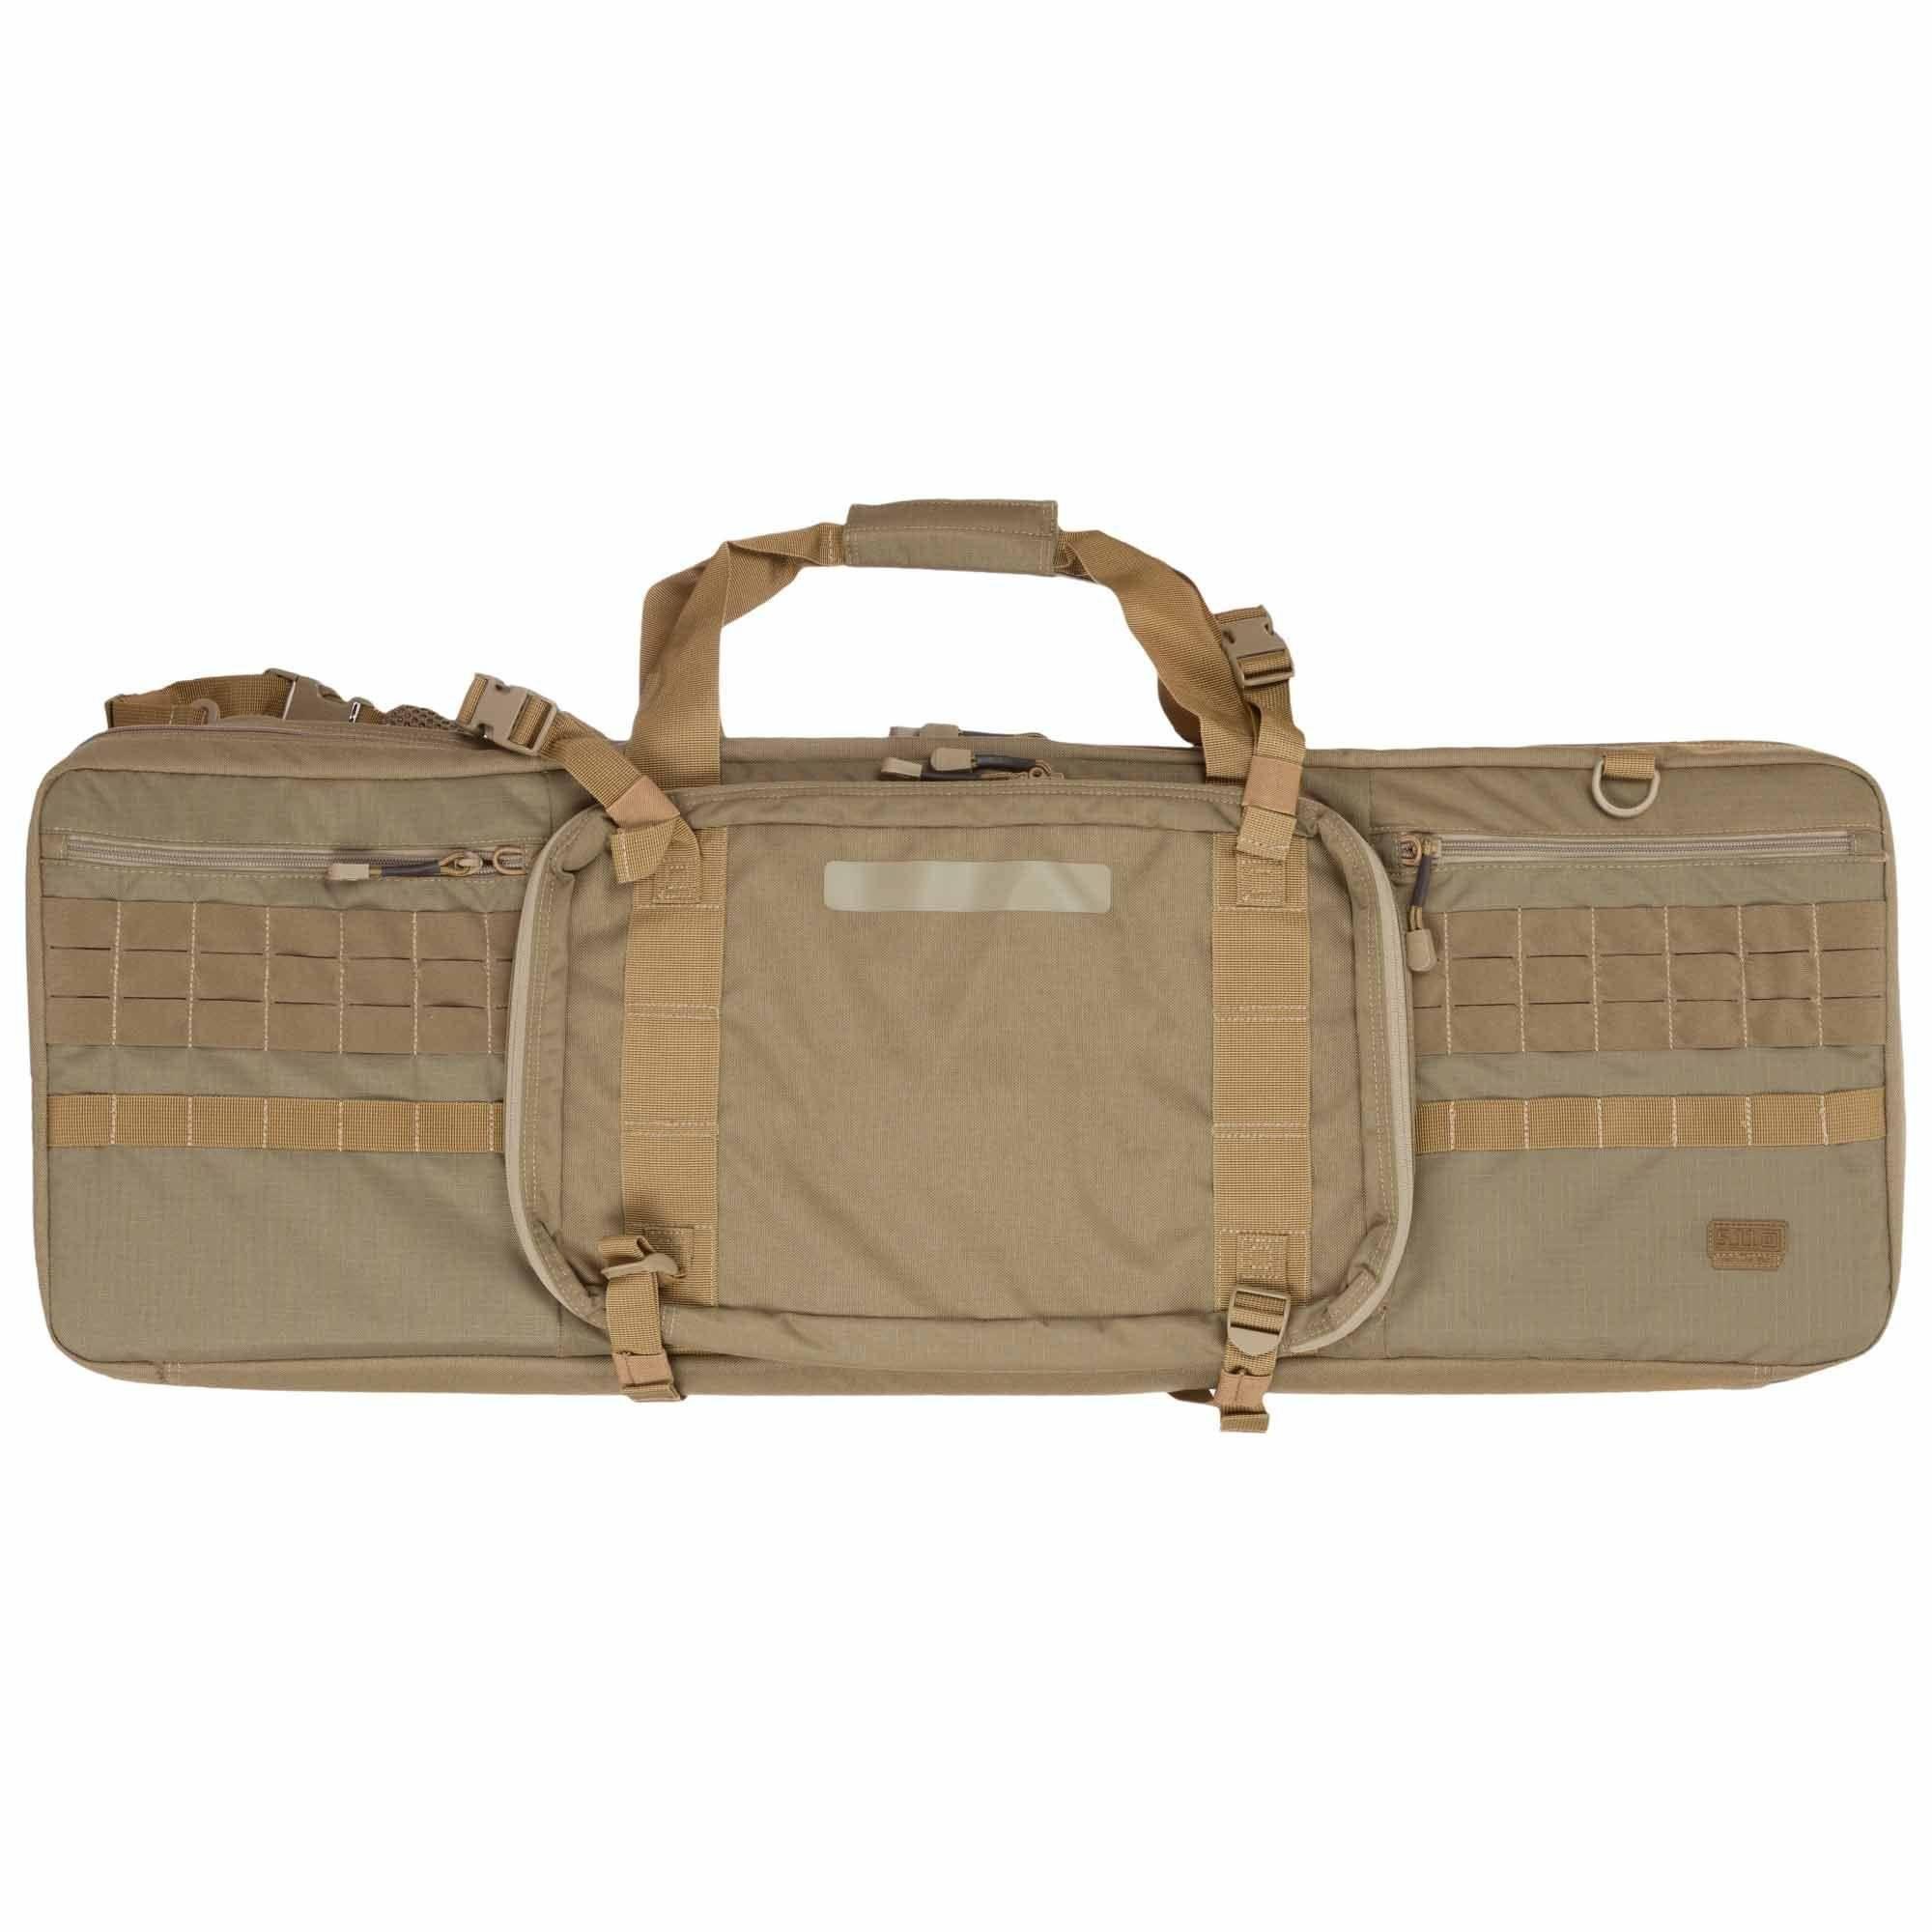 "5.11 Tactical 36"" Double Rifle Case Sandstone"